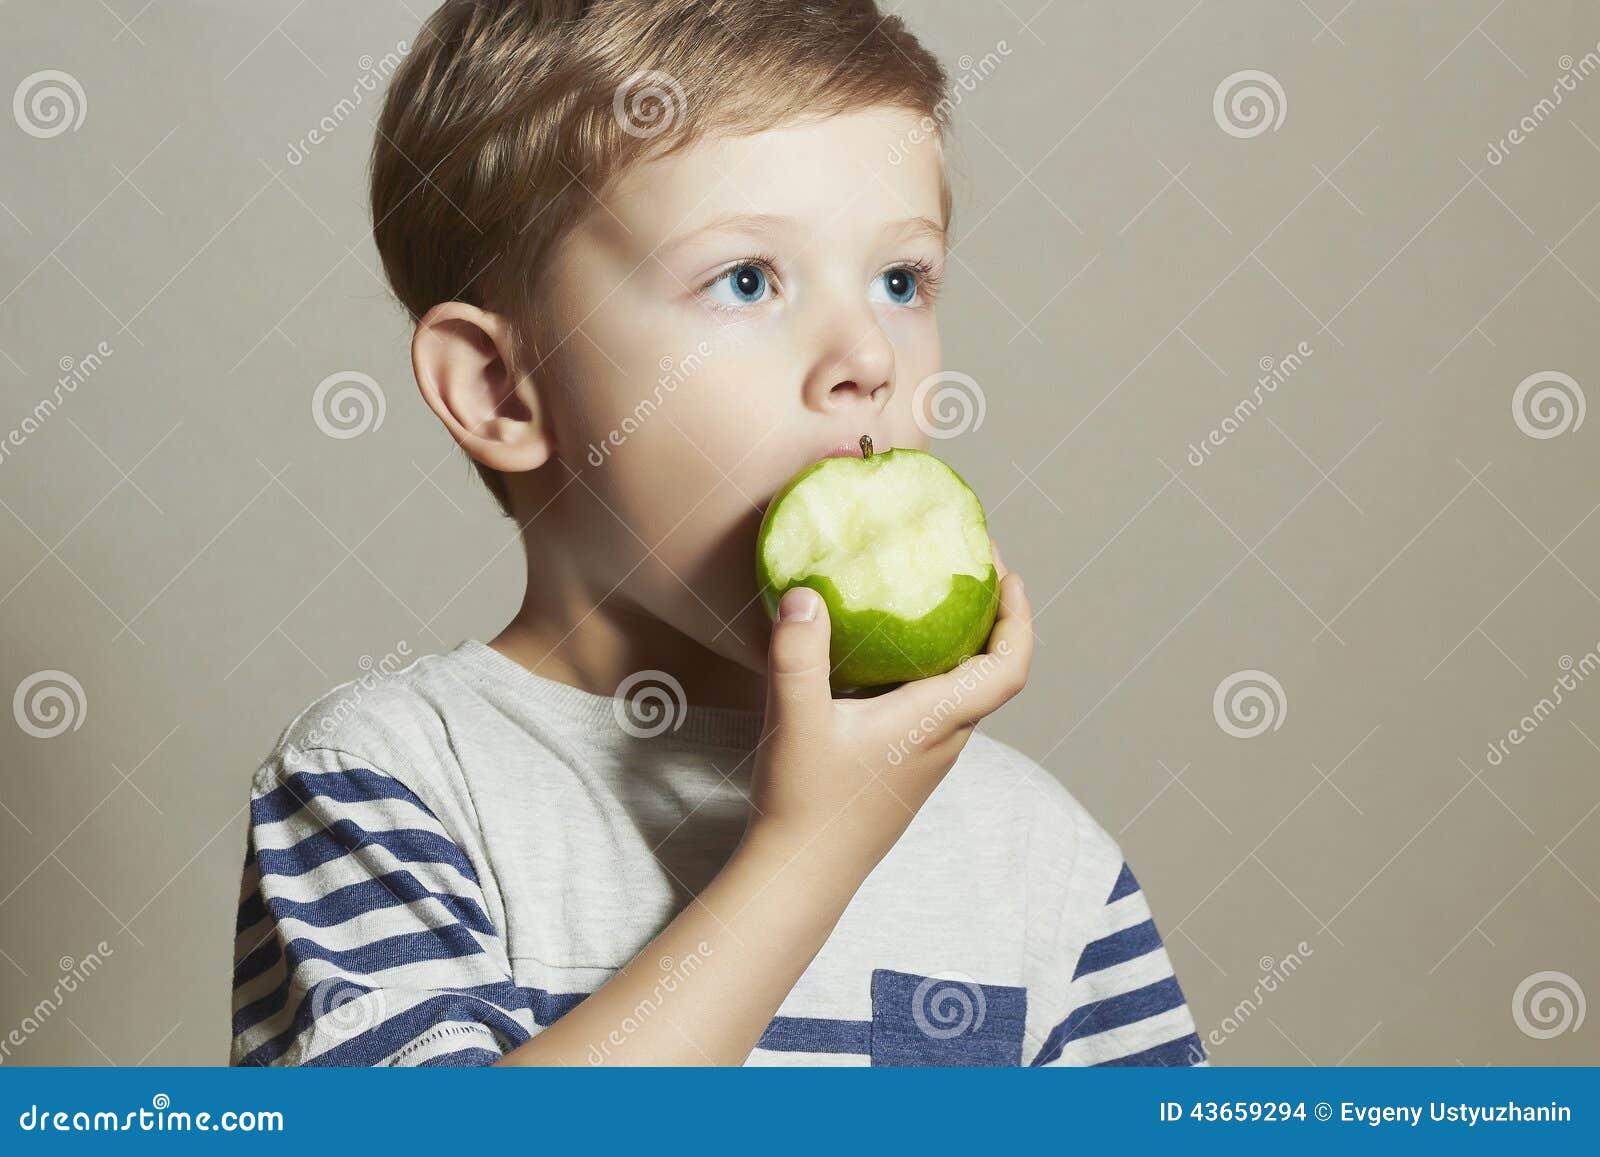 Funny Child eating apple.Little Boy. Health food. Fruits